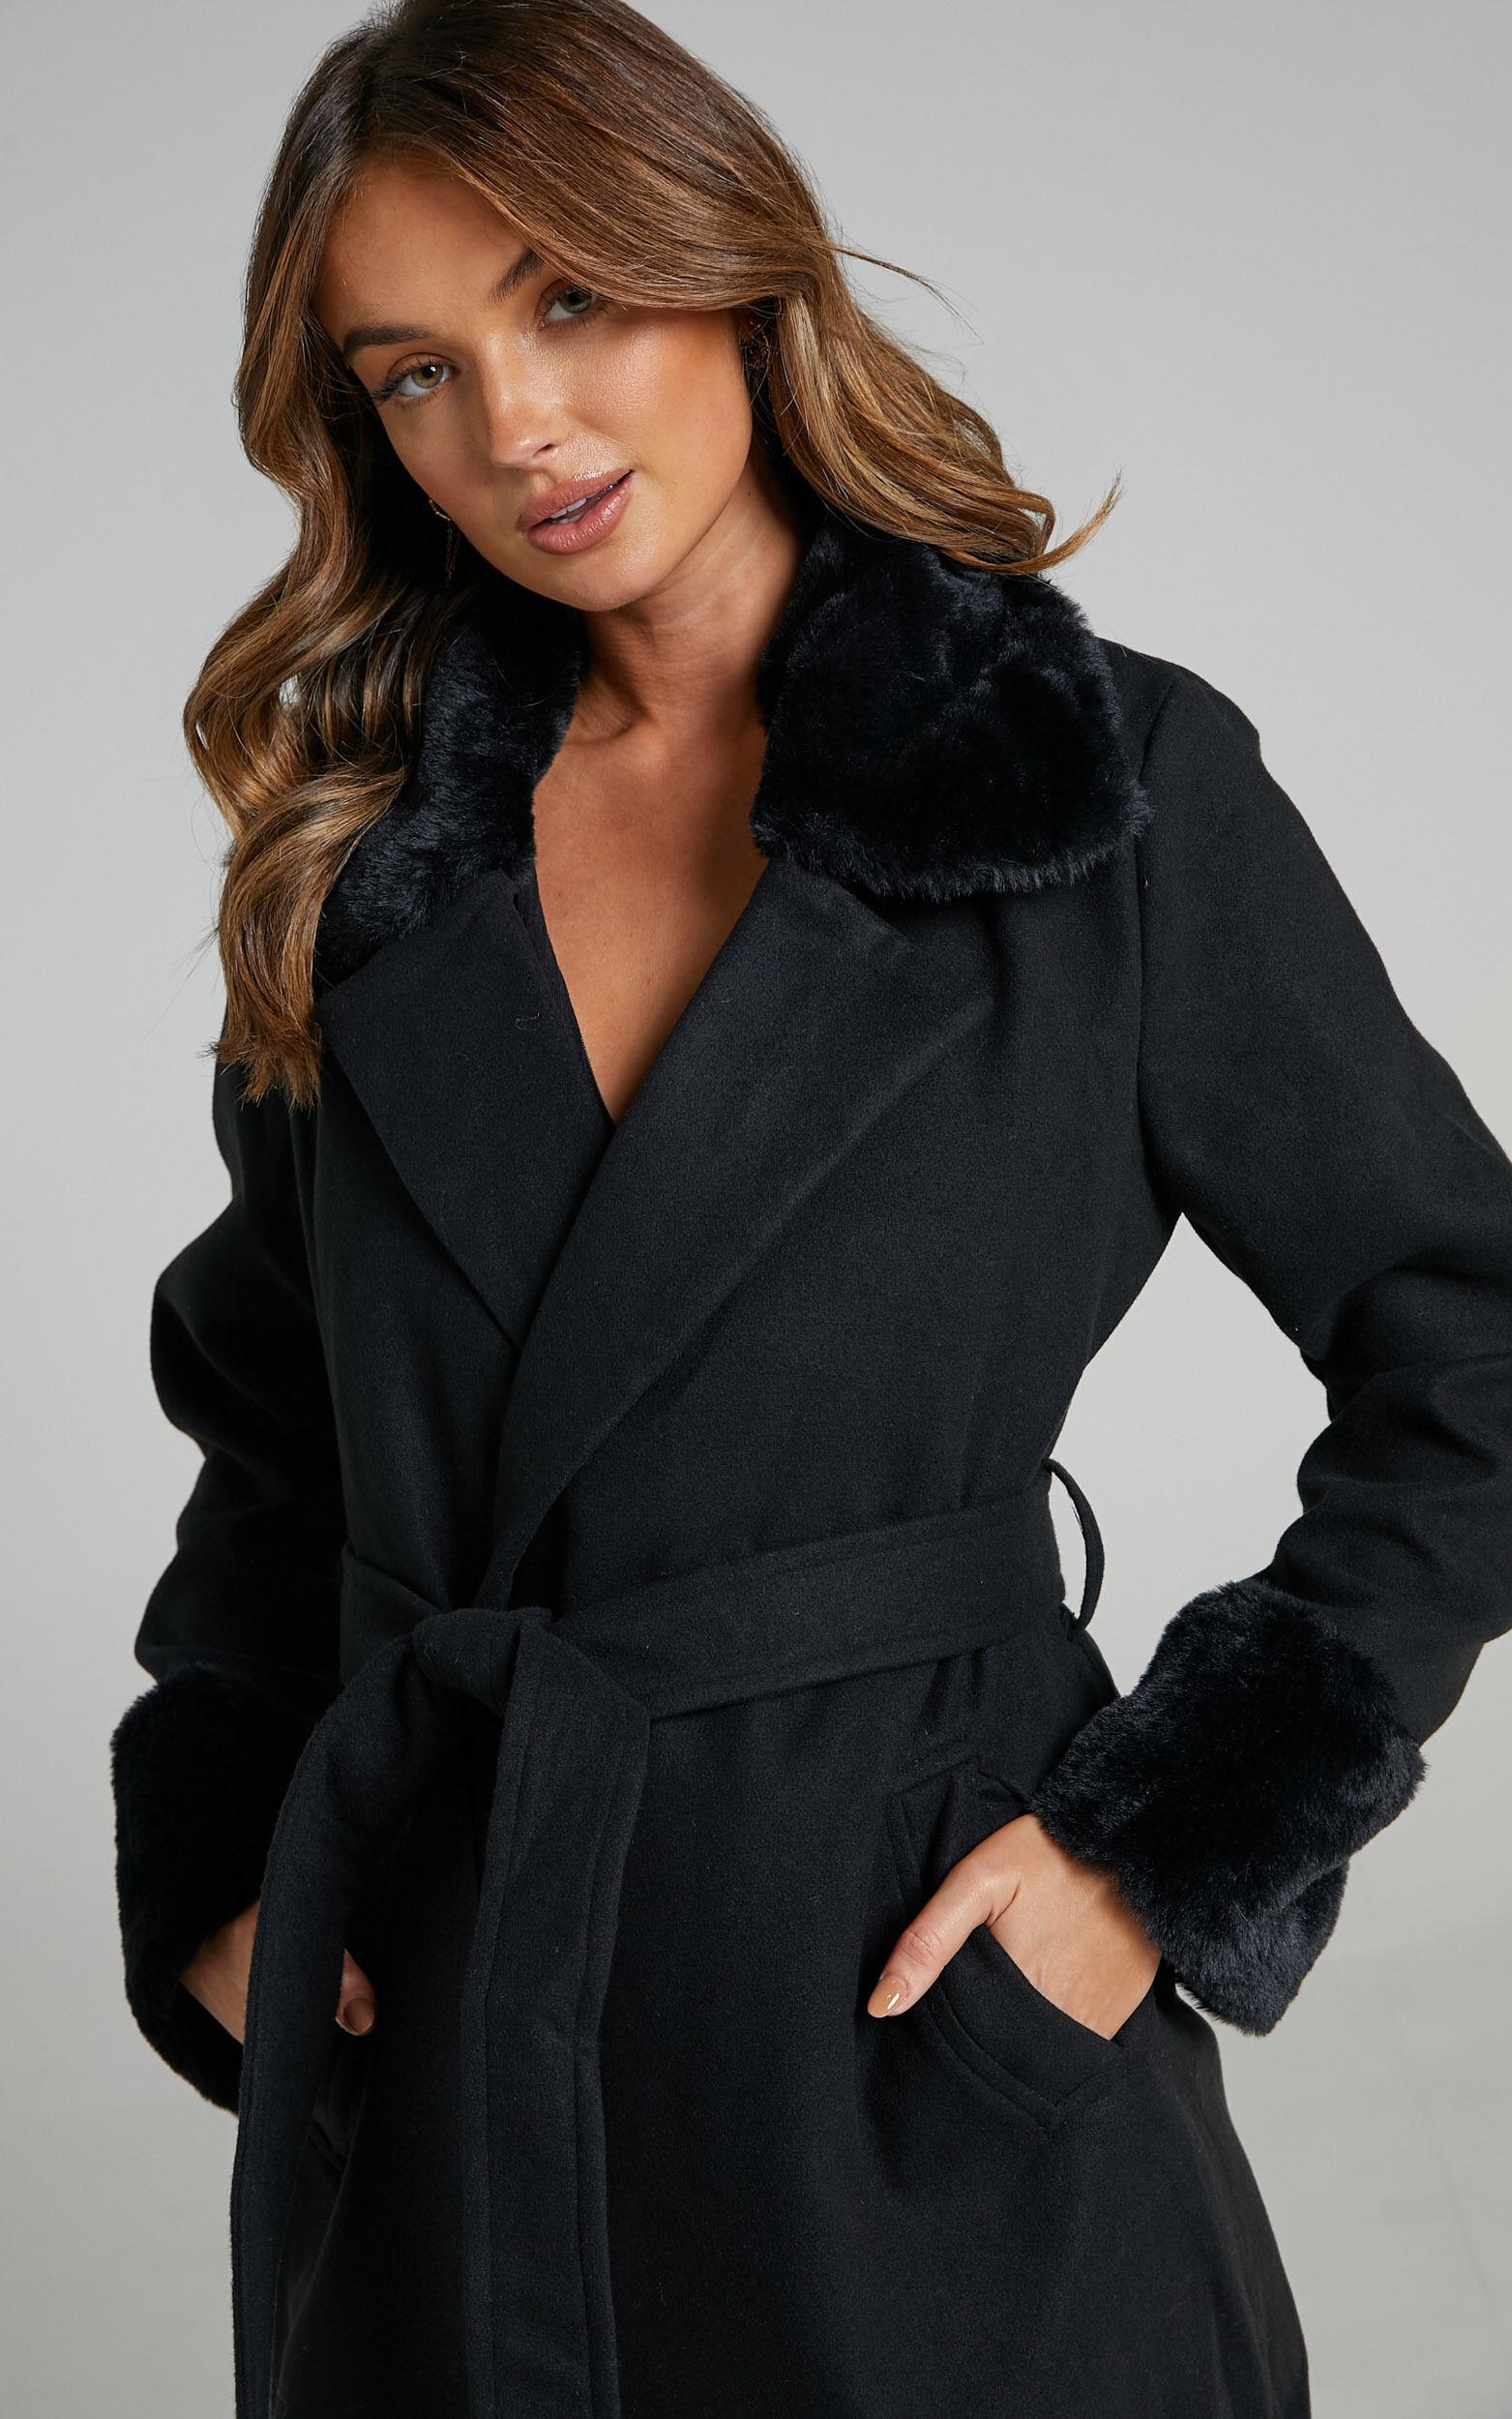 Manhattan Mornings Coat in Black - 14, BLK1, super-hi-res image number null